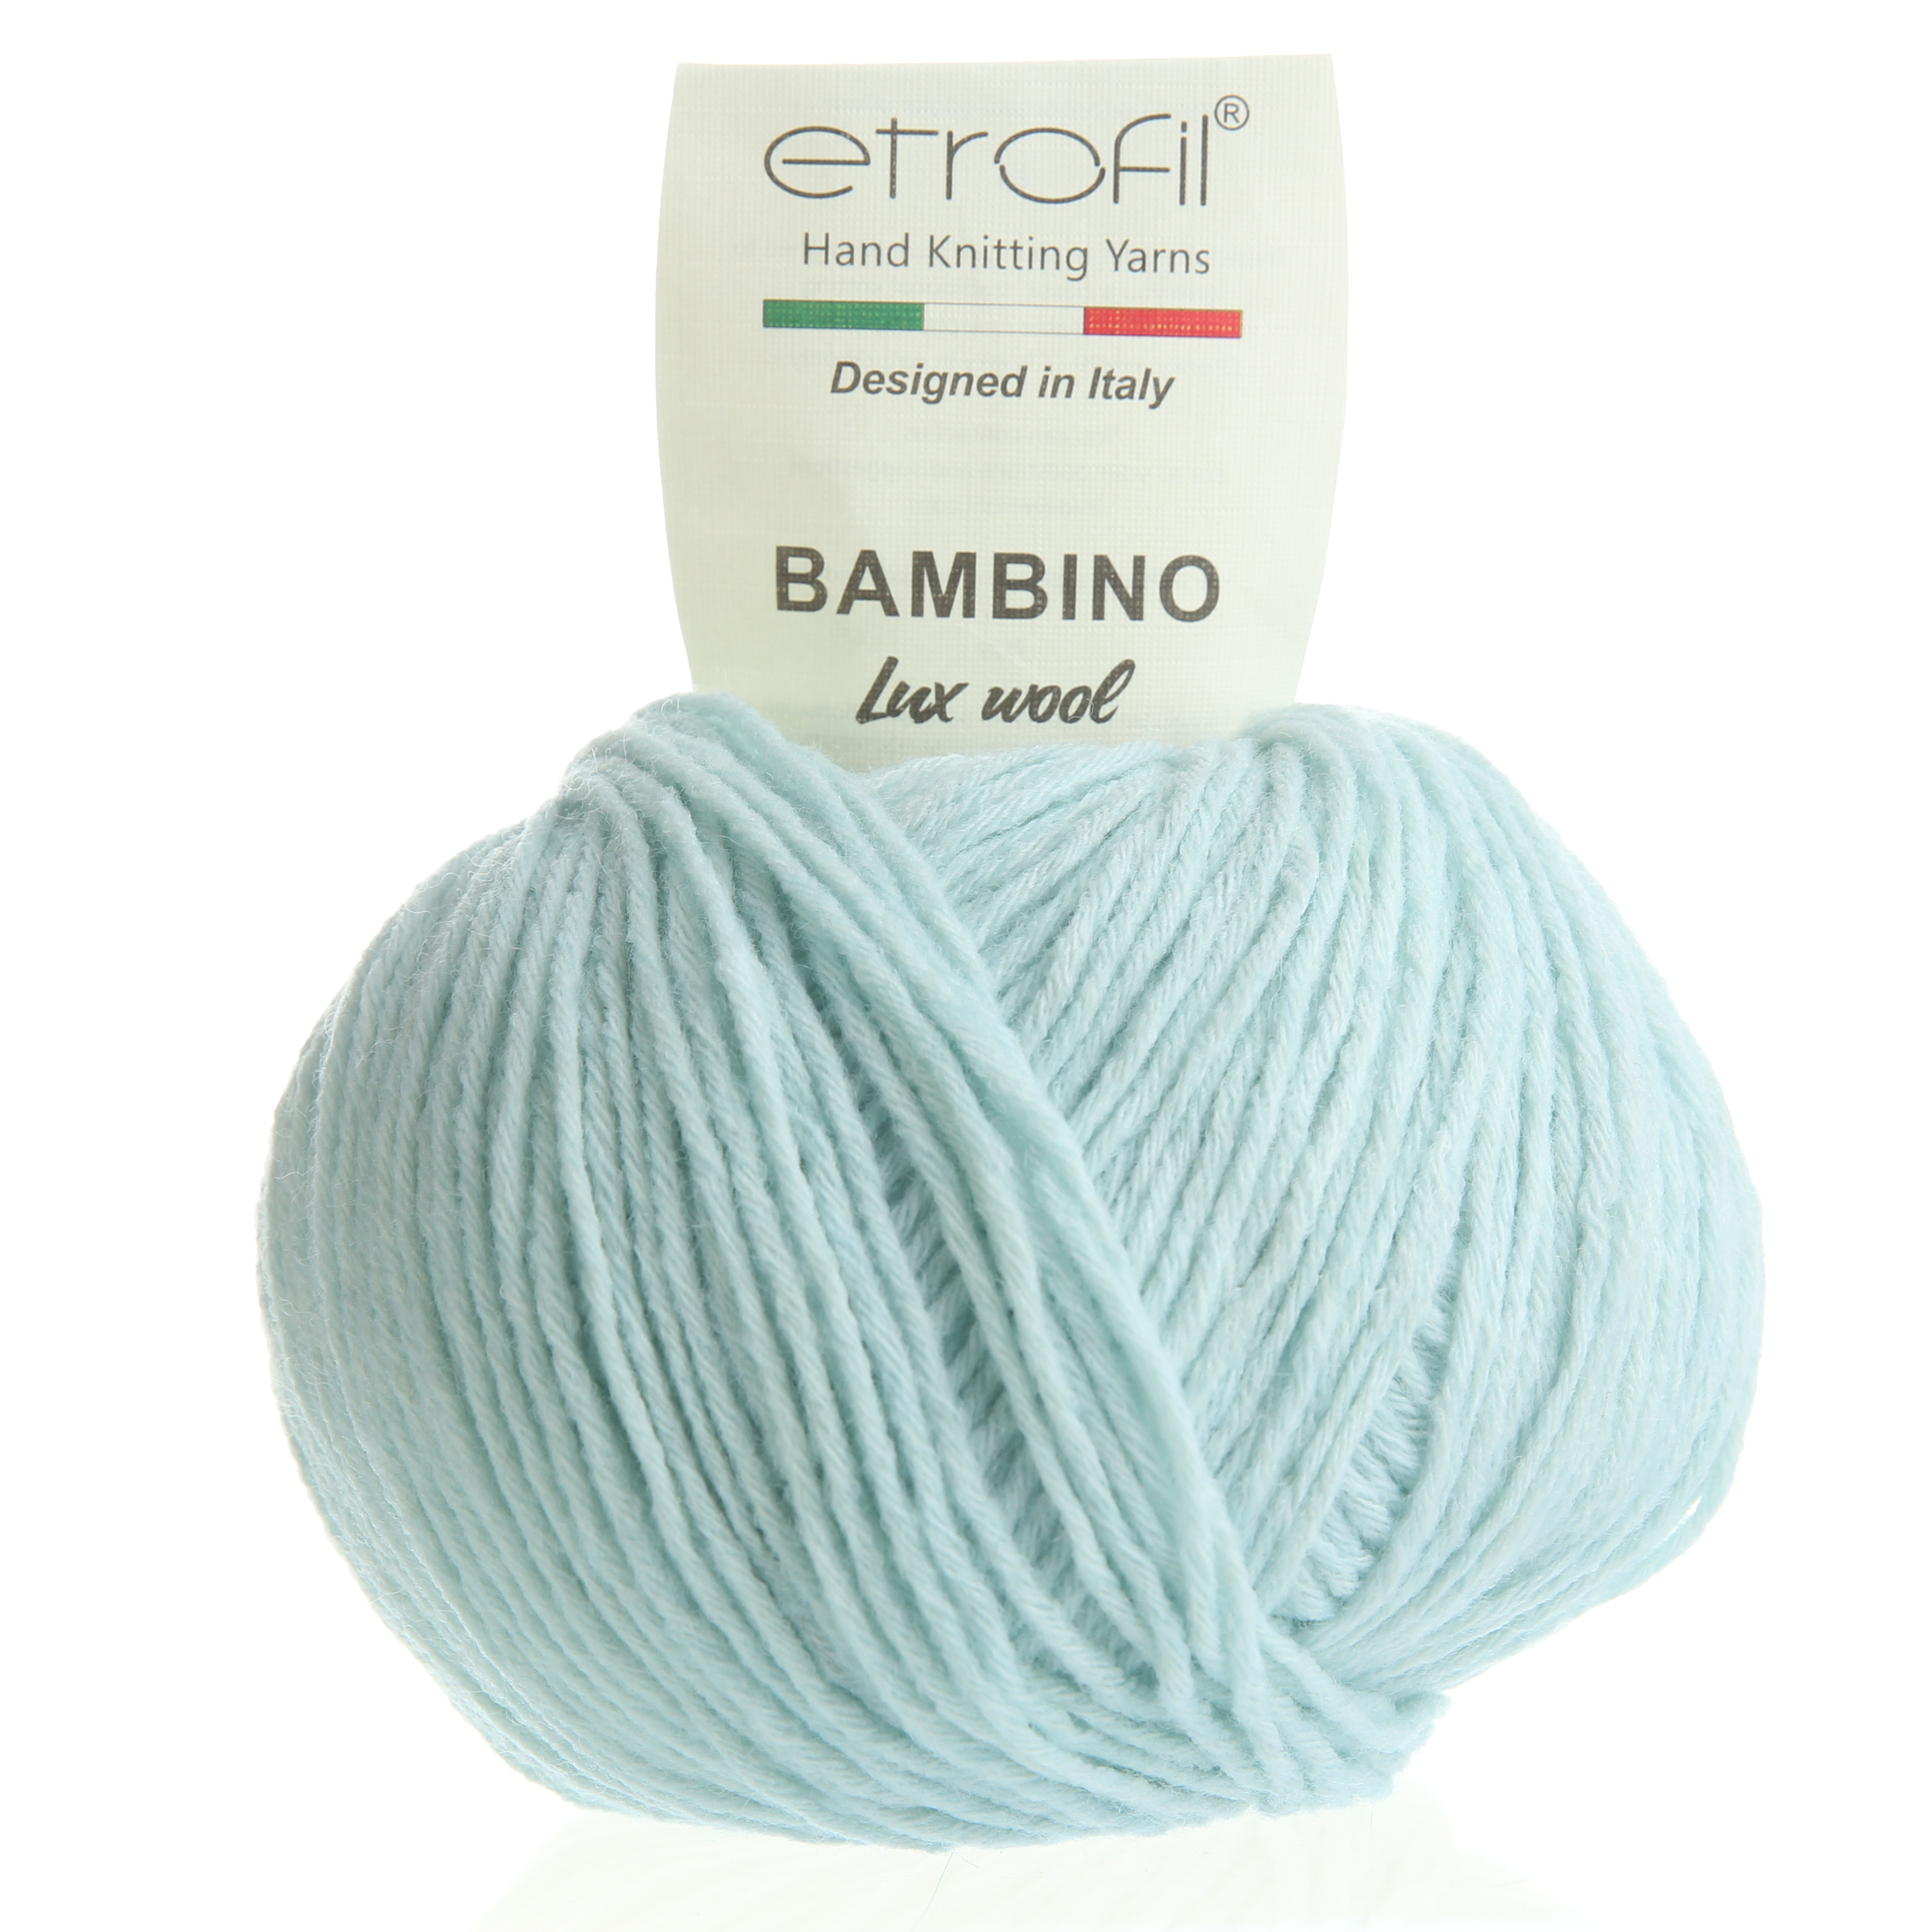 Etrofil Bambino Lux Wool (Этрофил Бамбино Люкс Вул) 70047 -мята заказать в Беларуси